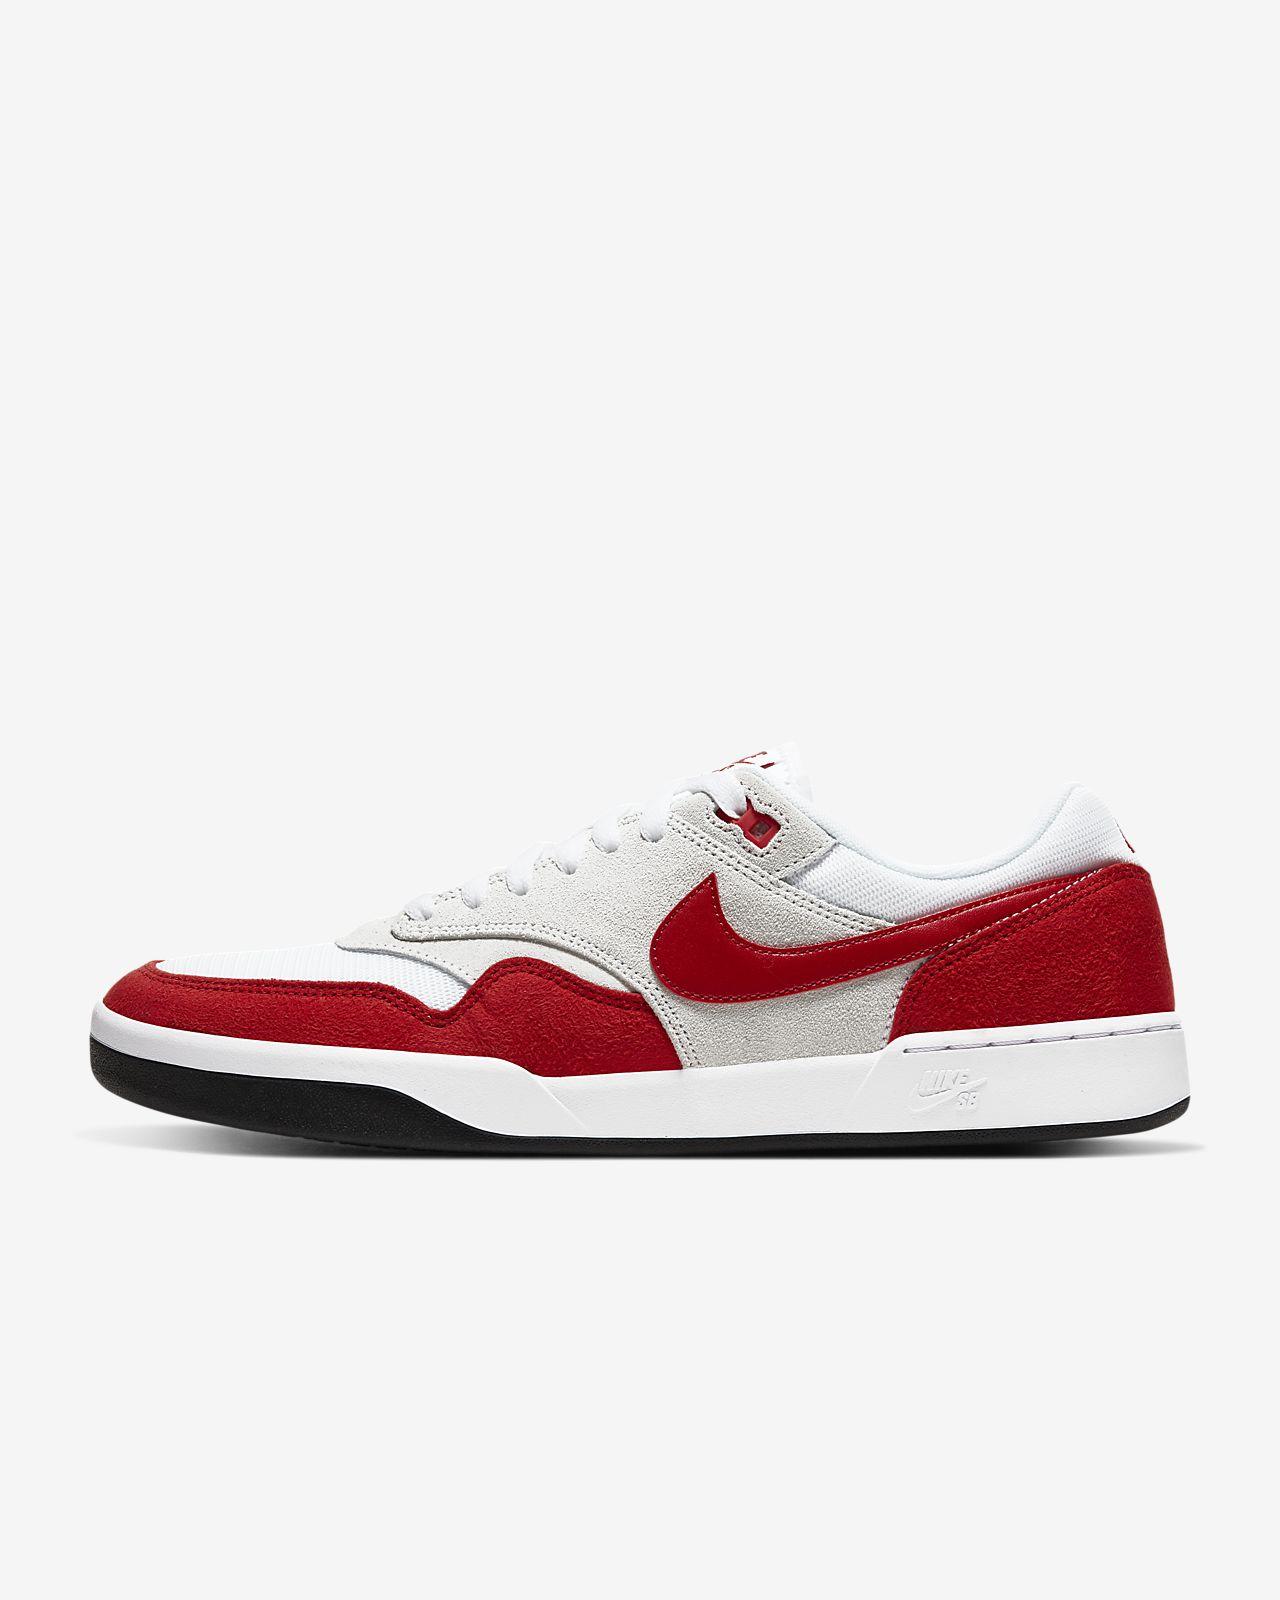 Nike Zoom Classic SB Black White Red | SneakerFiles